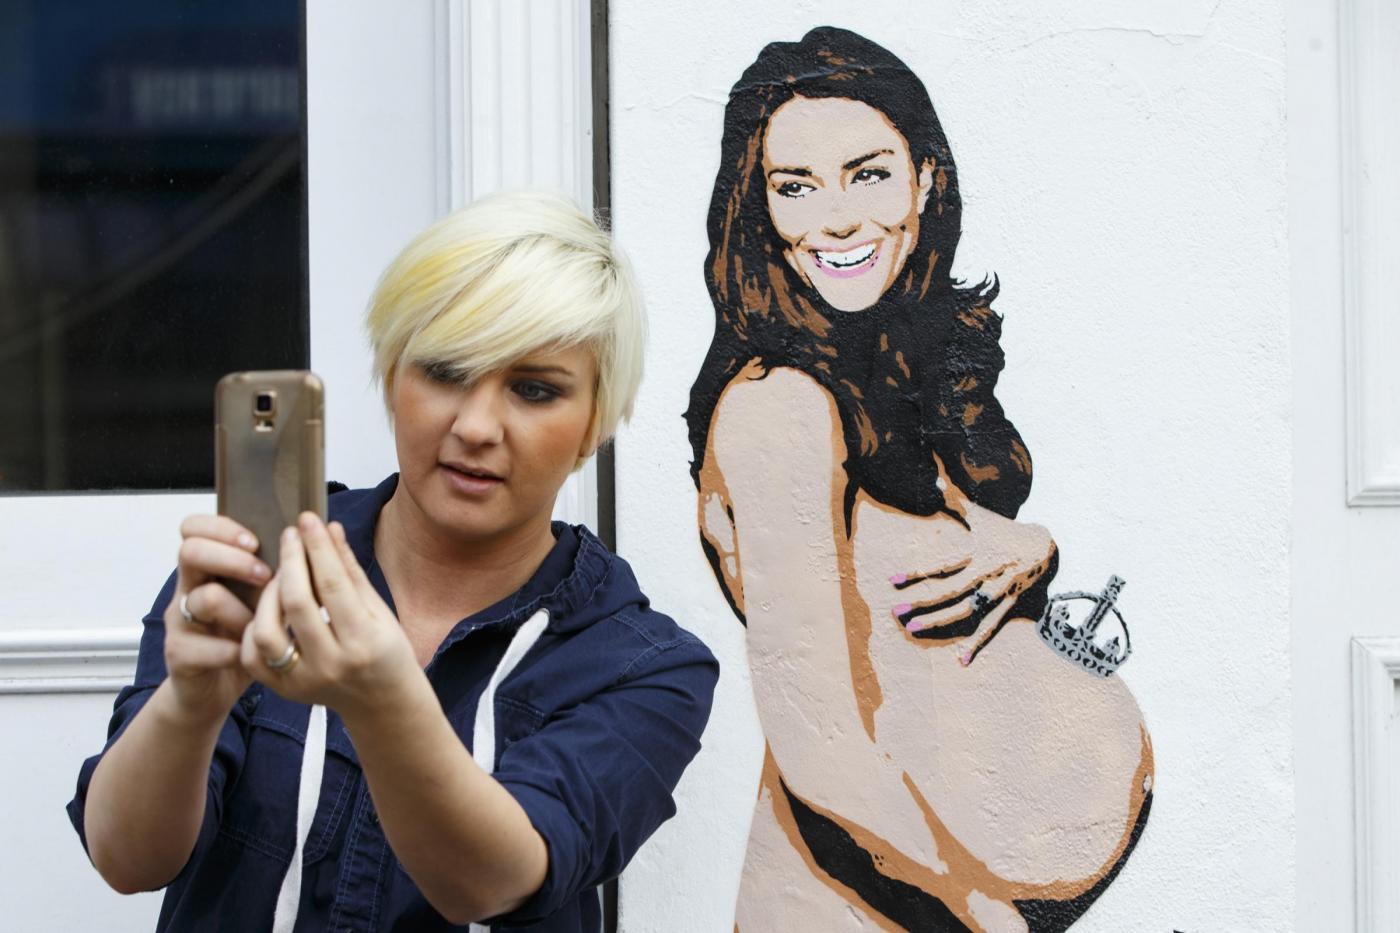 Graffiti a Londra raffiguranti la Principessa Kate col pancione